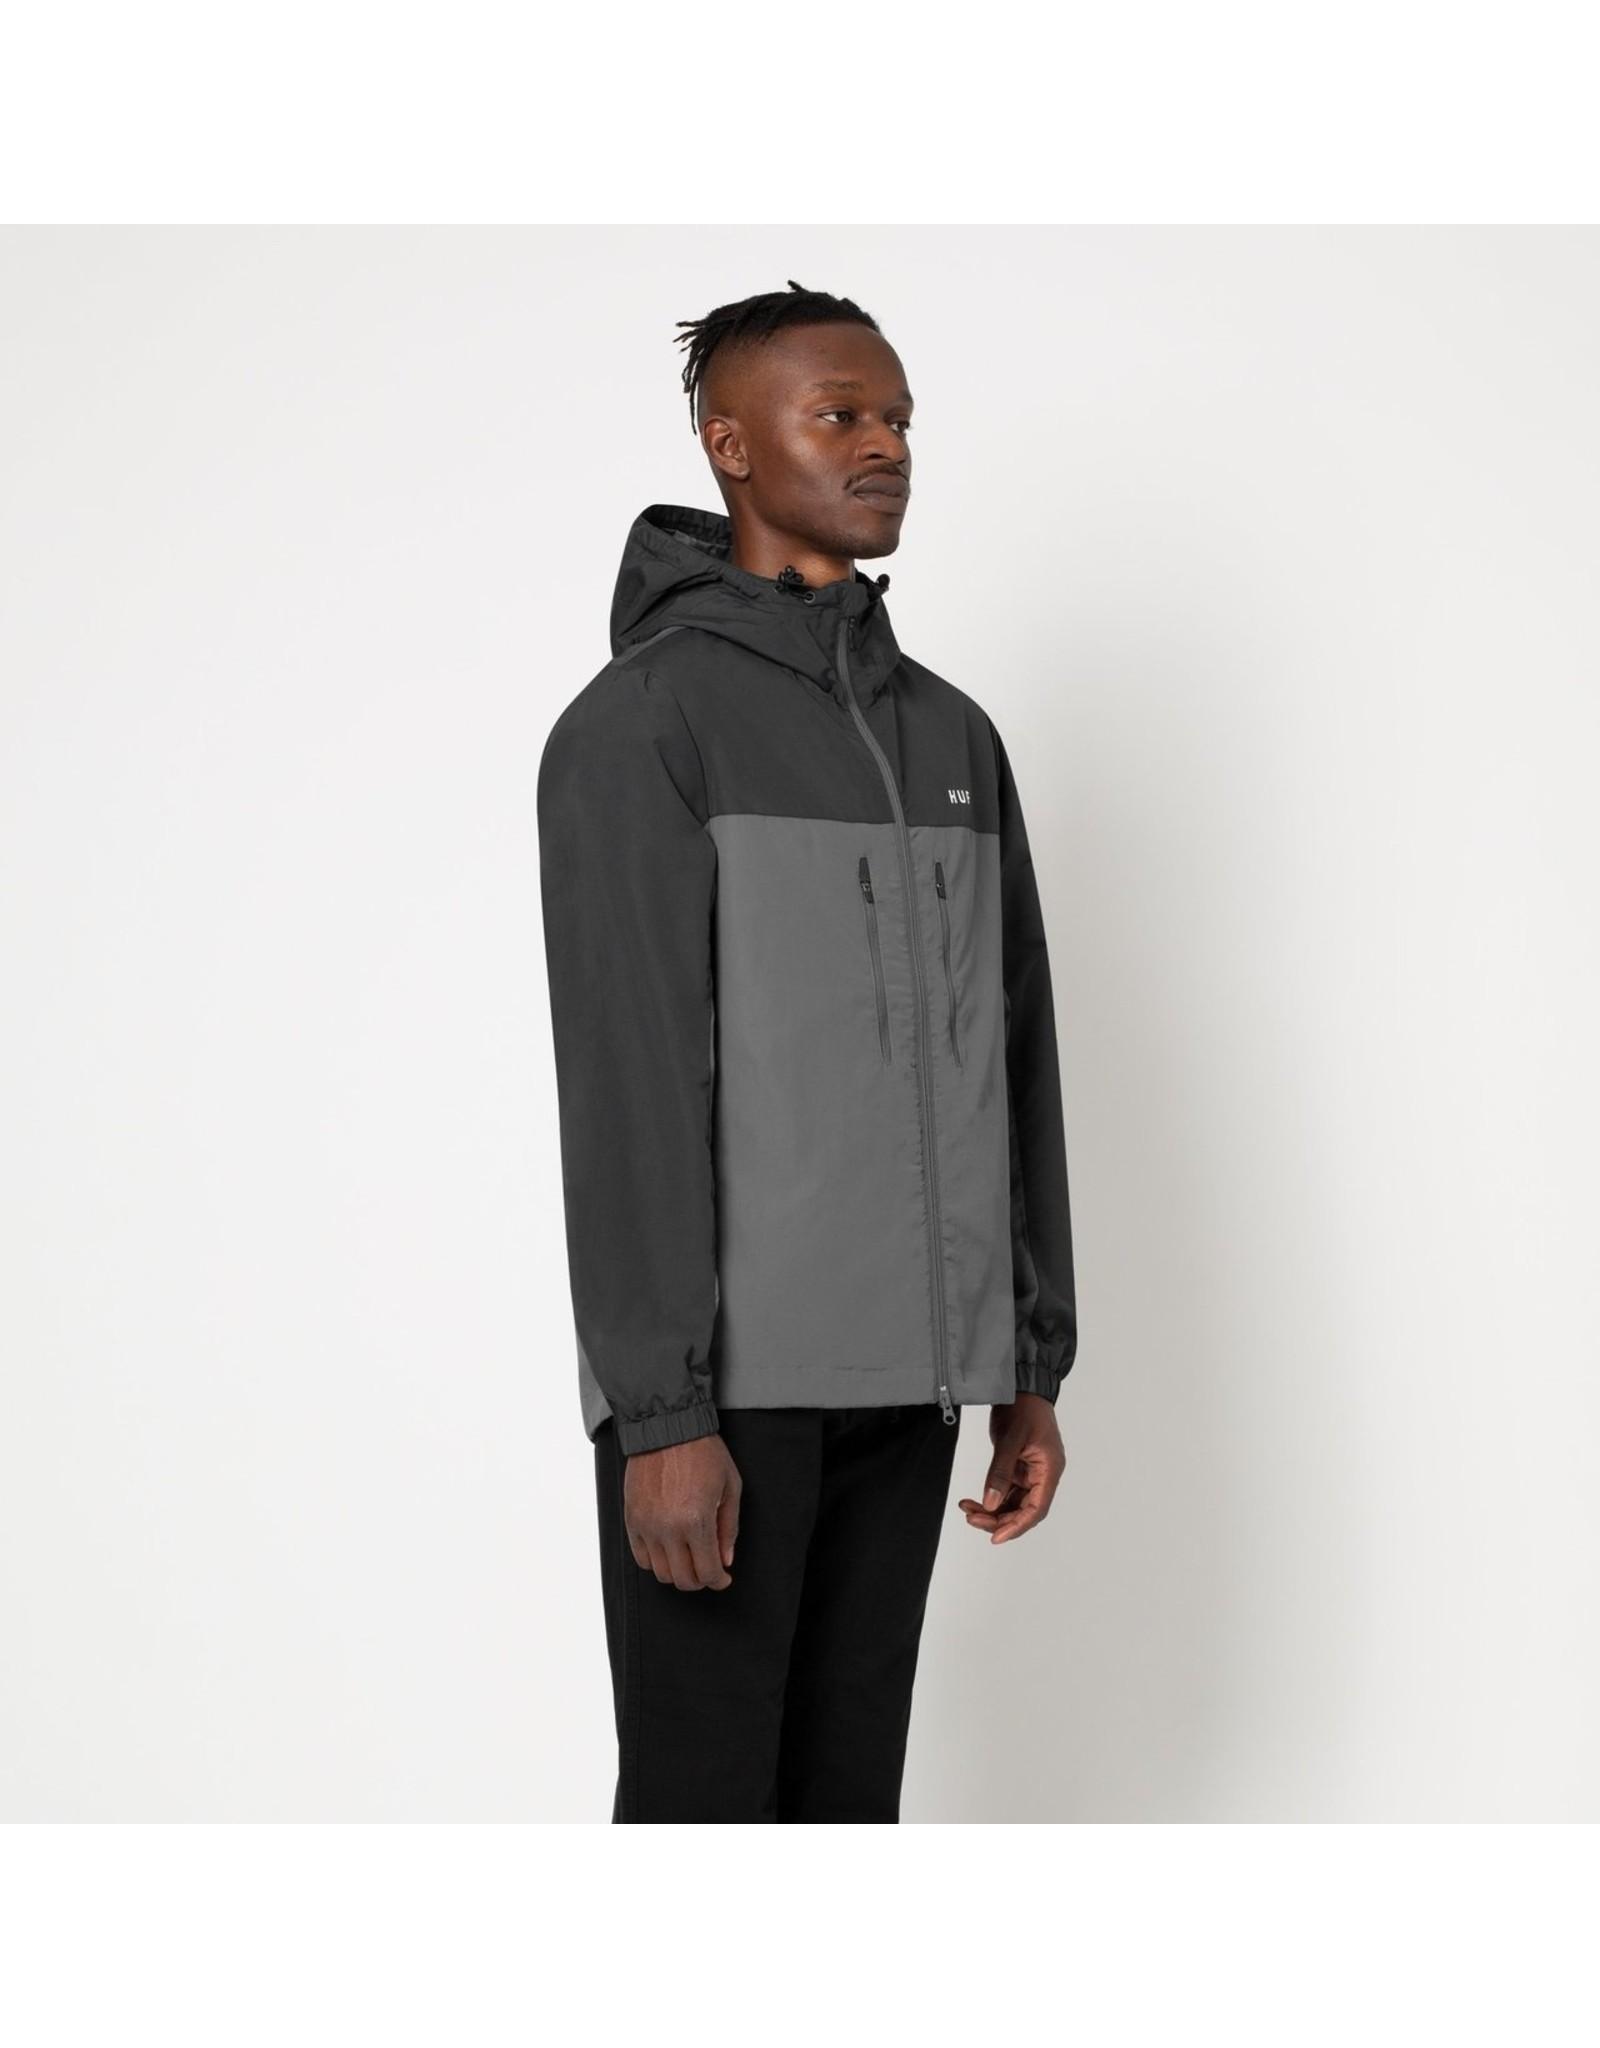 HUF Huf Standard Shell 3 Jacket Black